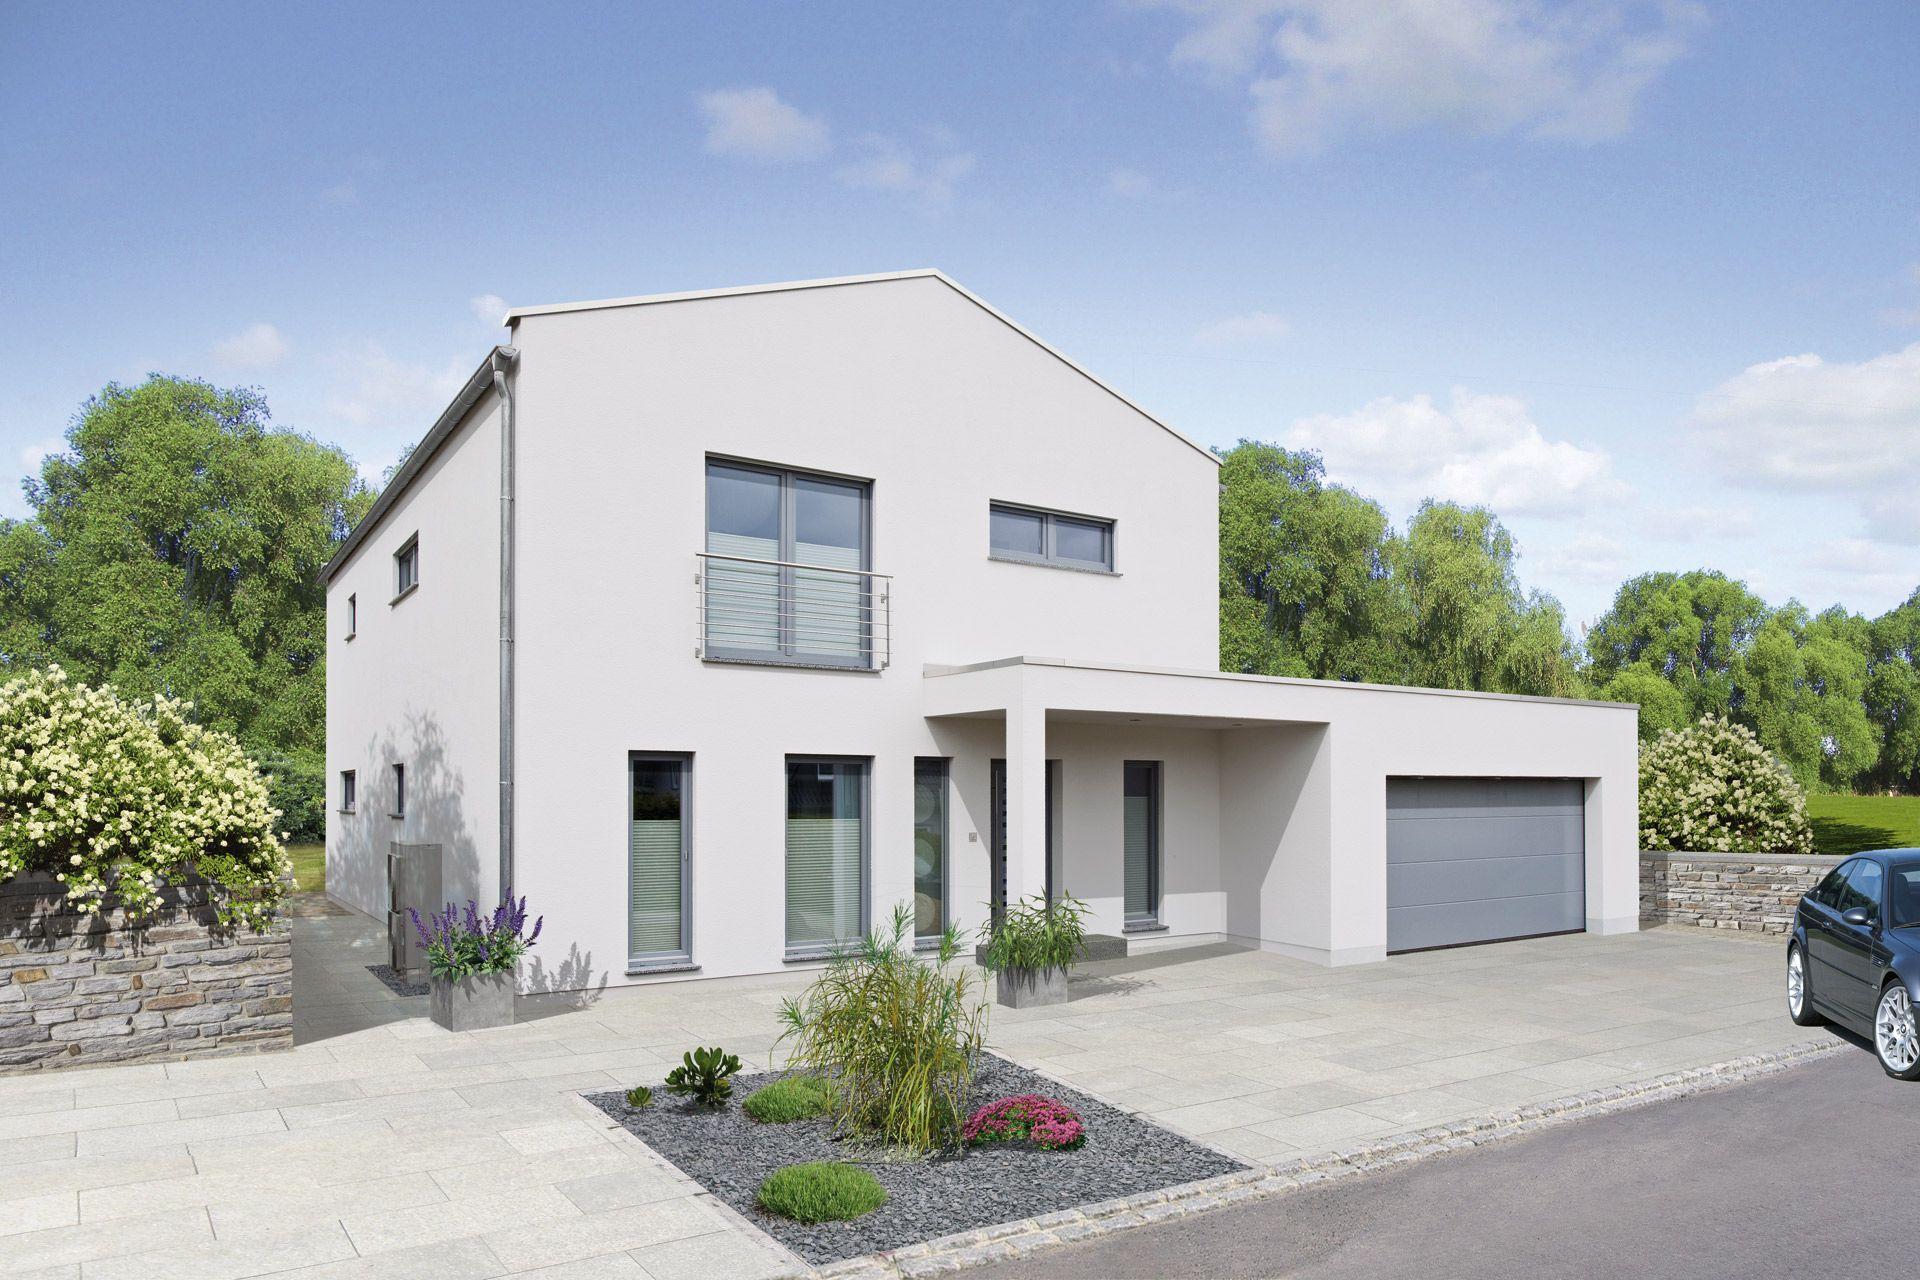 Moderne Satteldachhäuser satteldachhäuser architektur future house